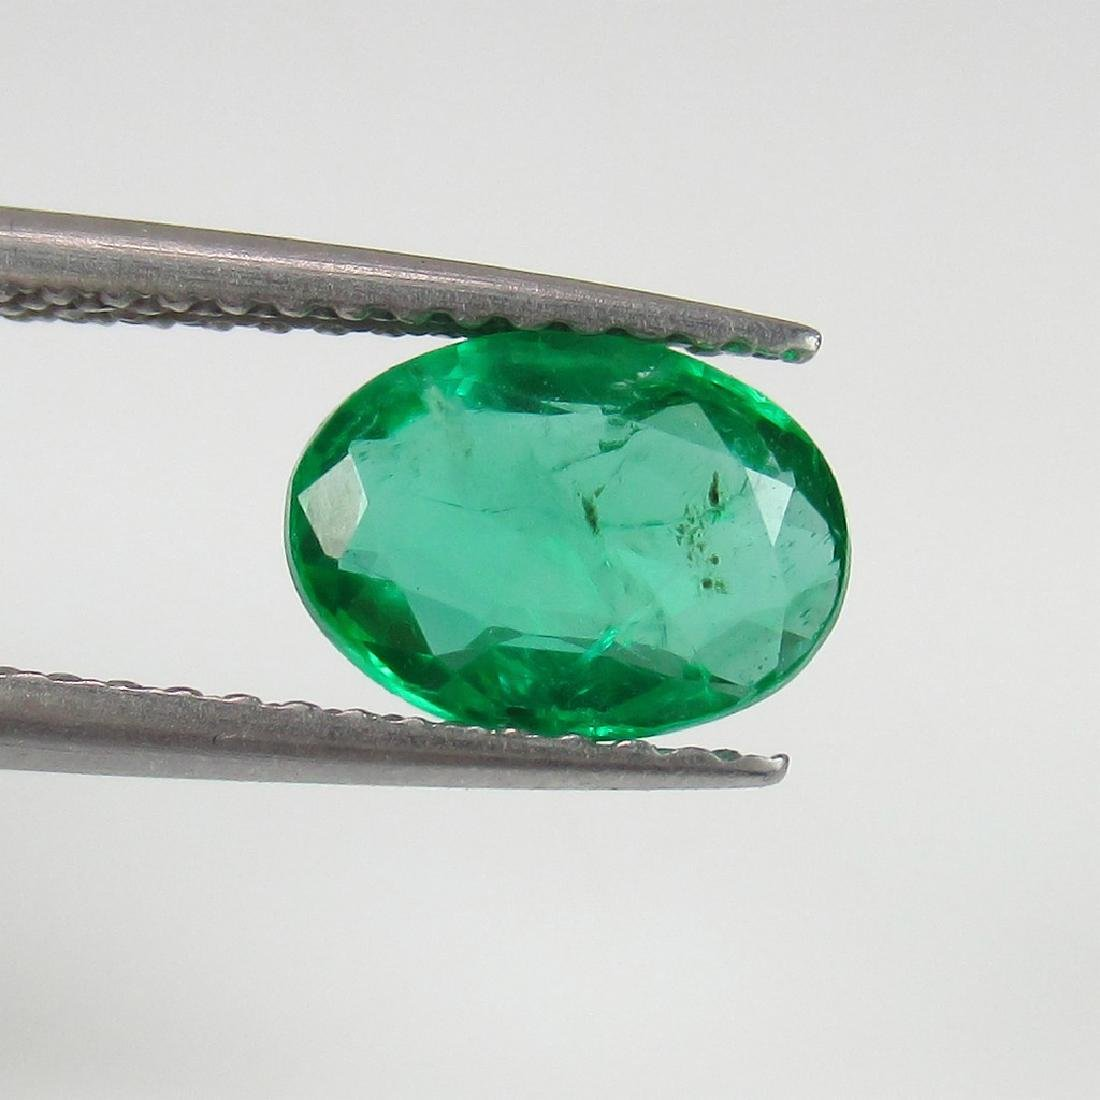 1.27 Carat Loose Zambian Emerald Oval cut Green